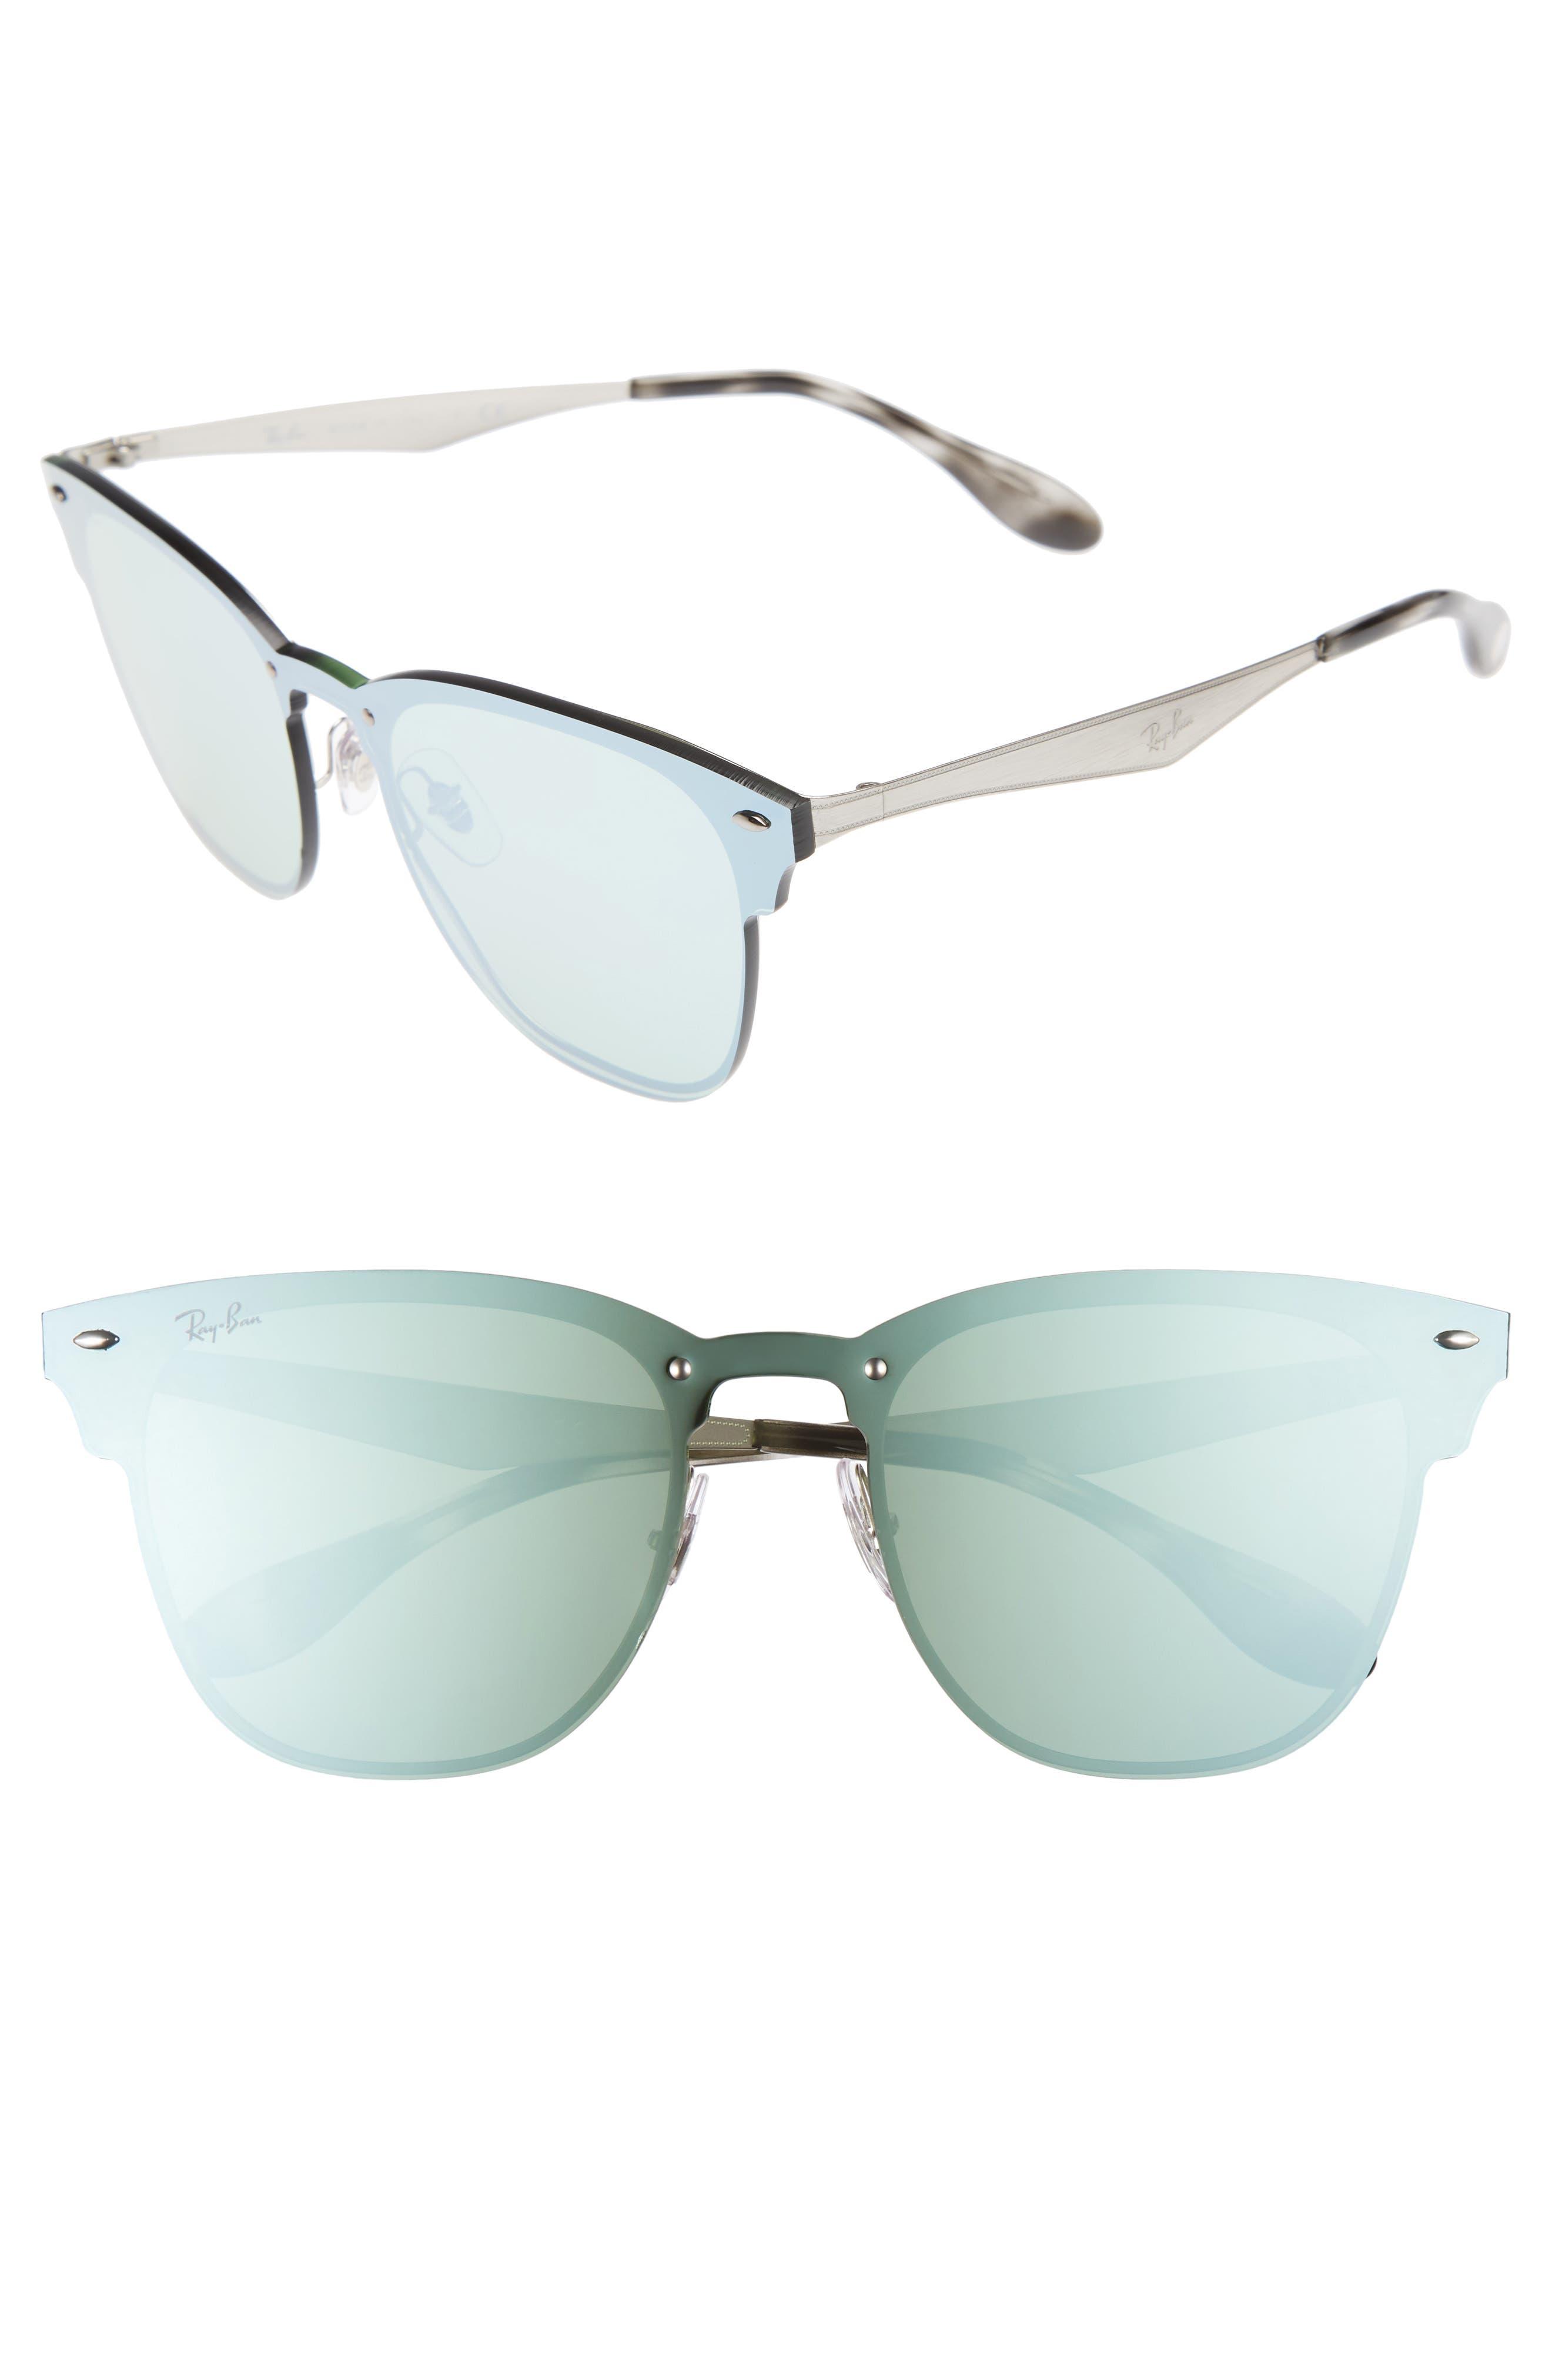 Ray-Ban Wayfarer 42mm Sunglasses